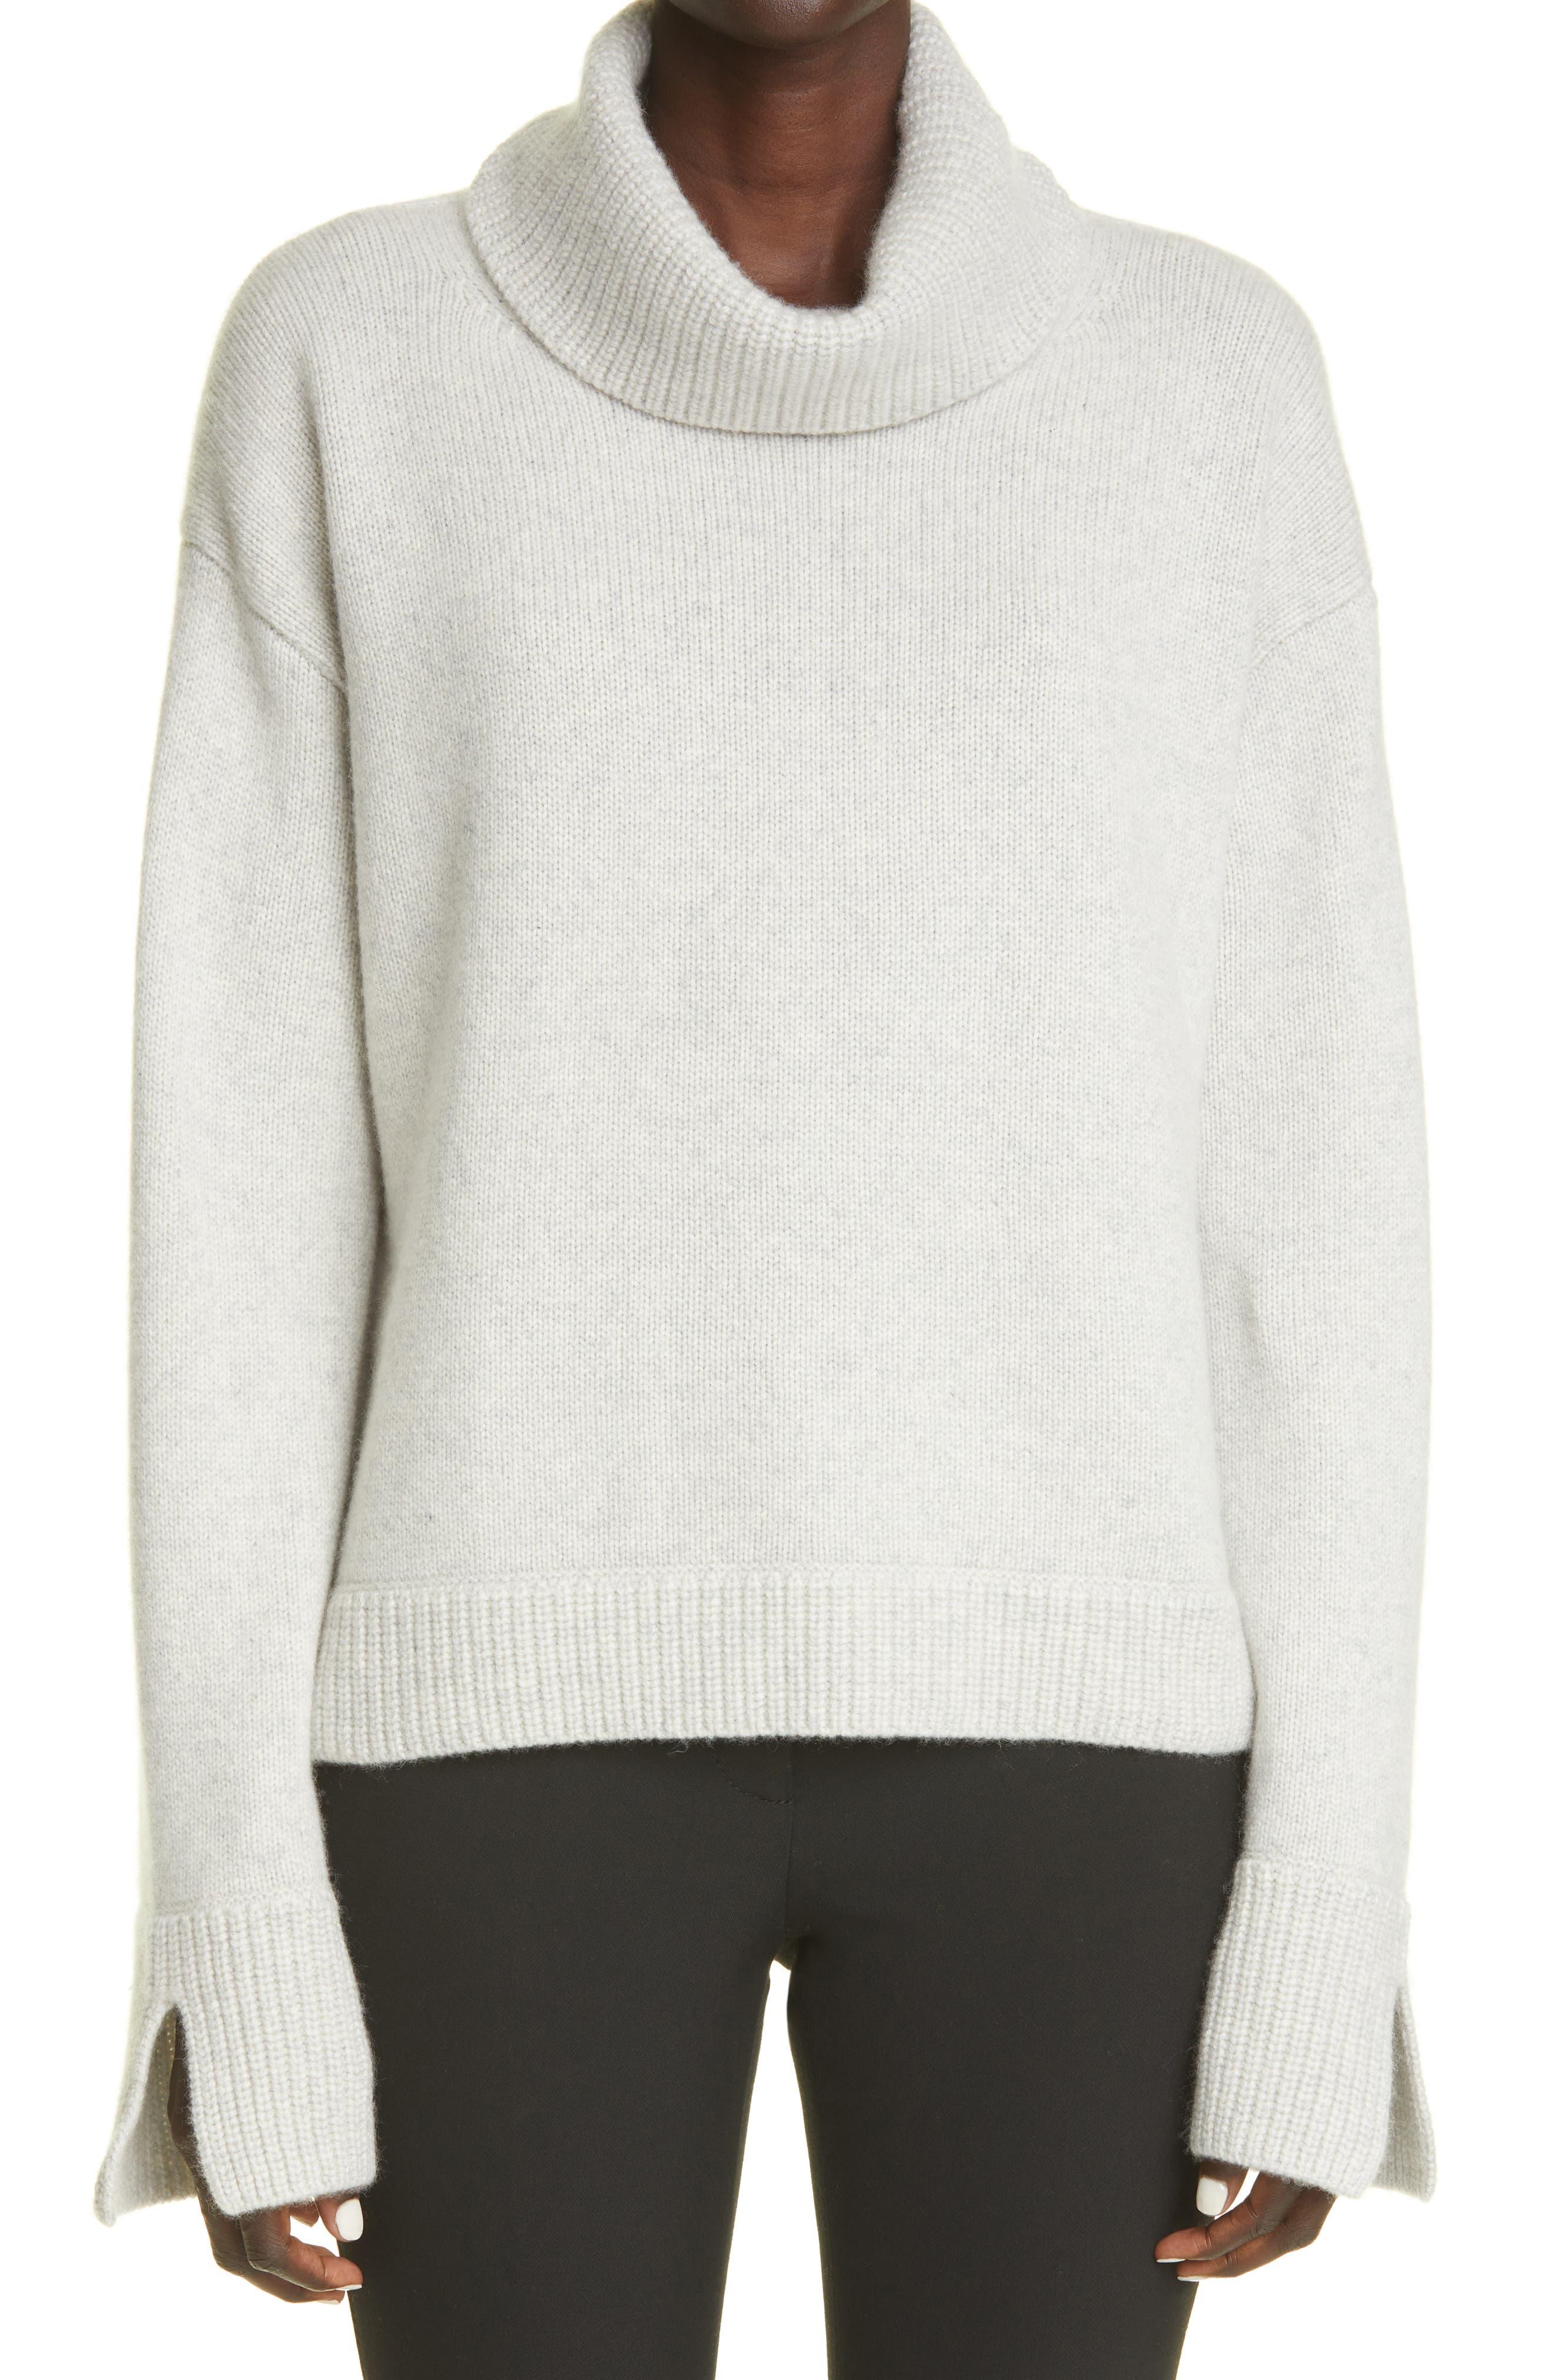 Parsons Turtleneck Green Cashmere Sweater